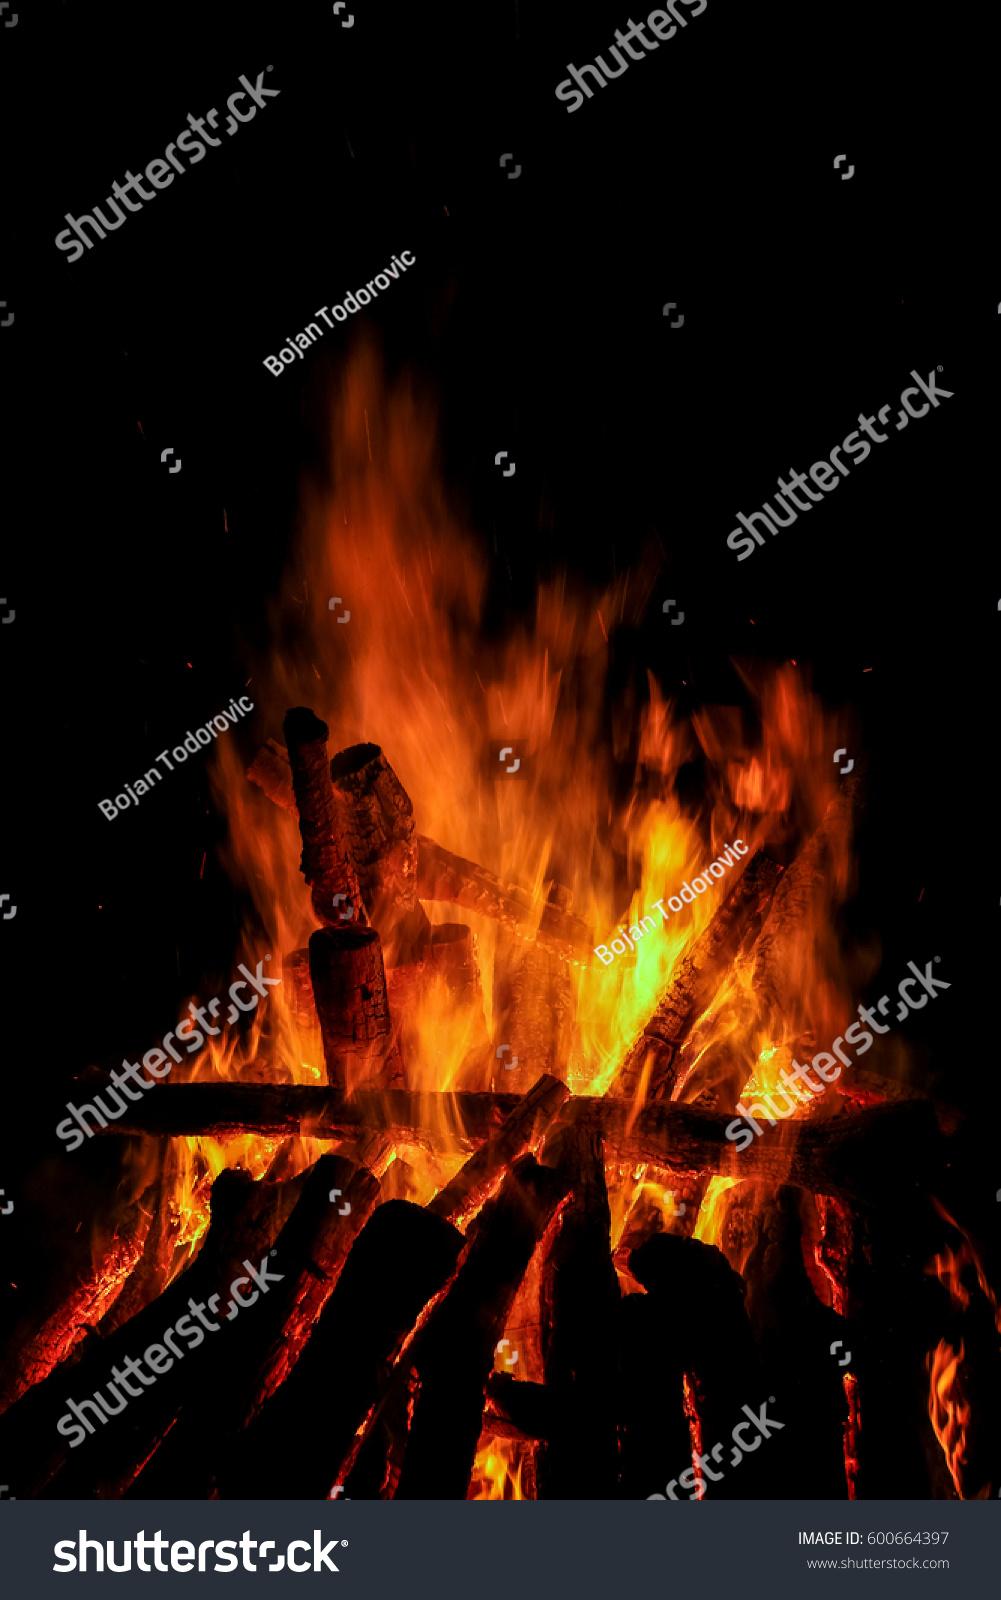 bonfire beach night stock photo (edit now) 600664397 - shutterstock